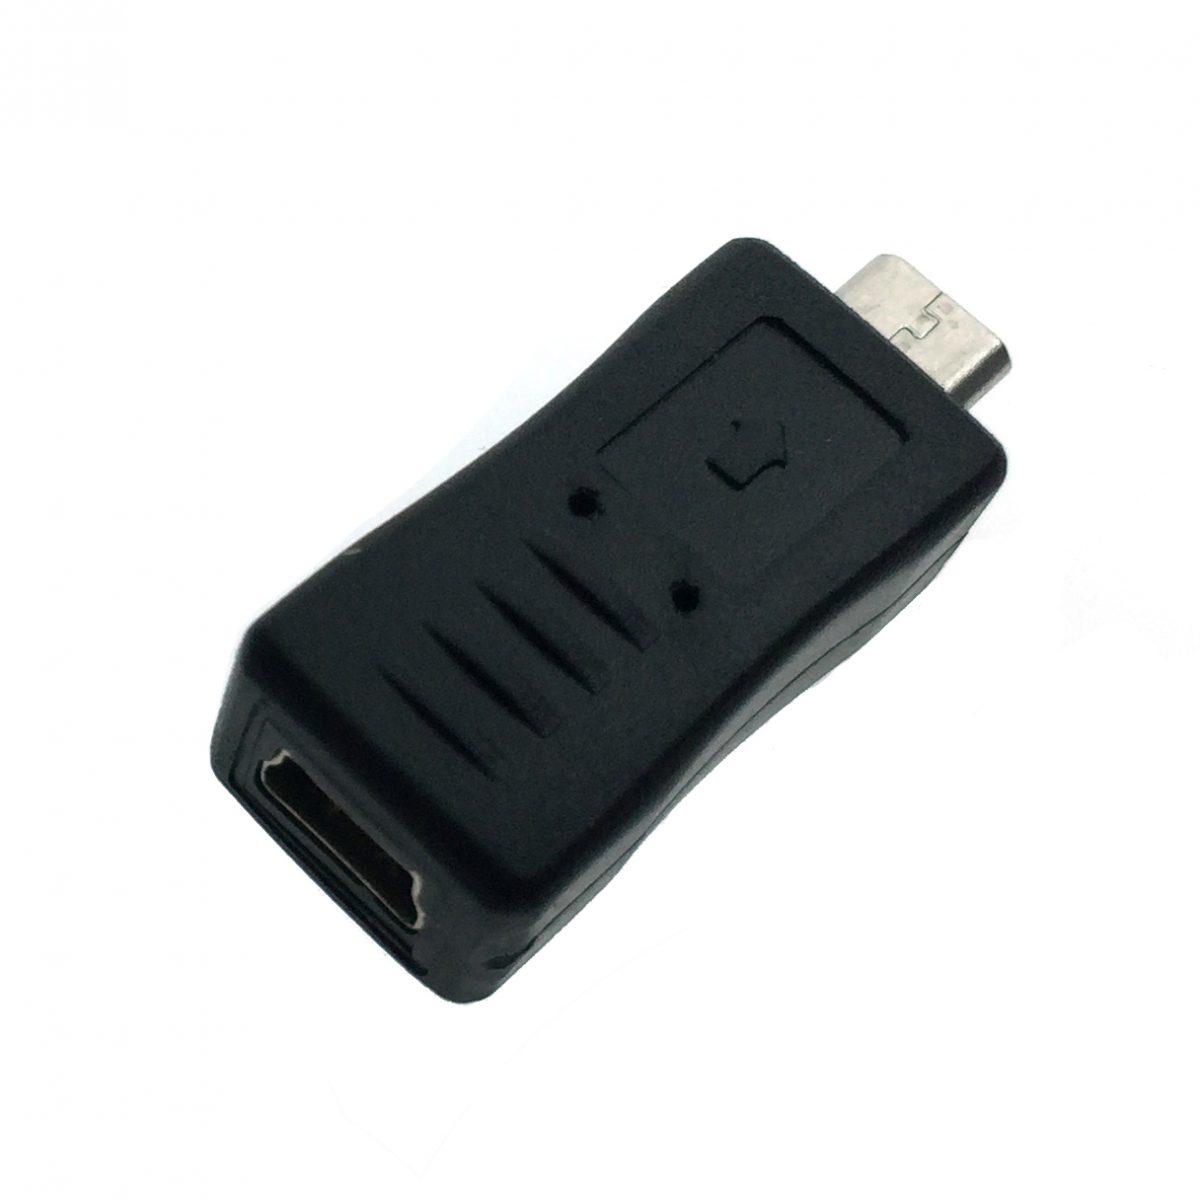 Переходник micro USB type B male to mini USB type B female, EUSB2mnBF-mcBM Espada